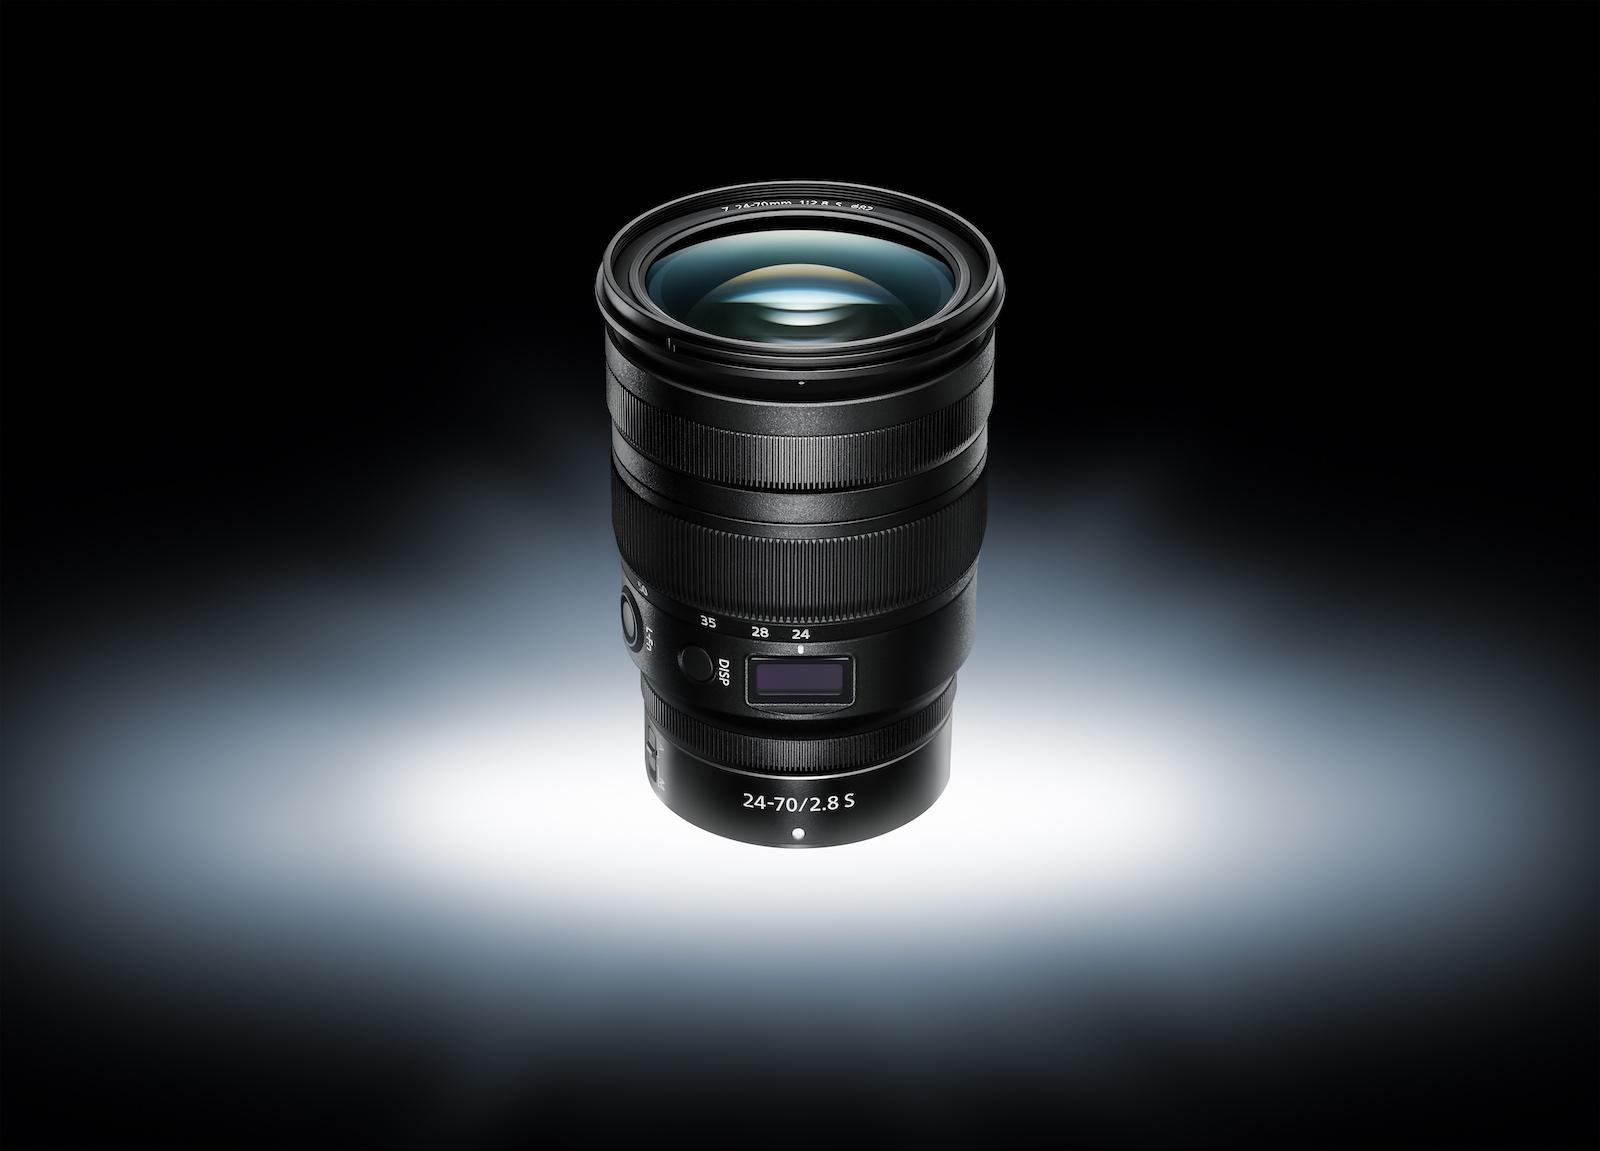 Neues Nikon Trinity Objektiv